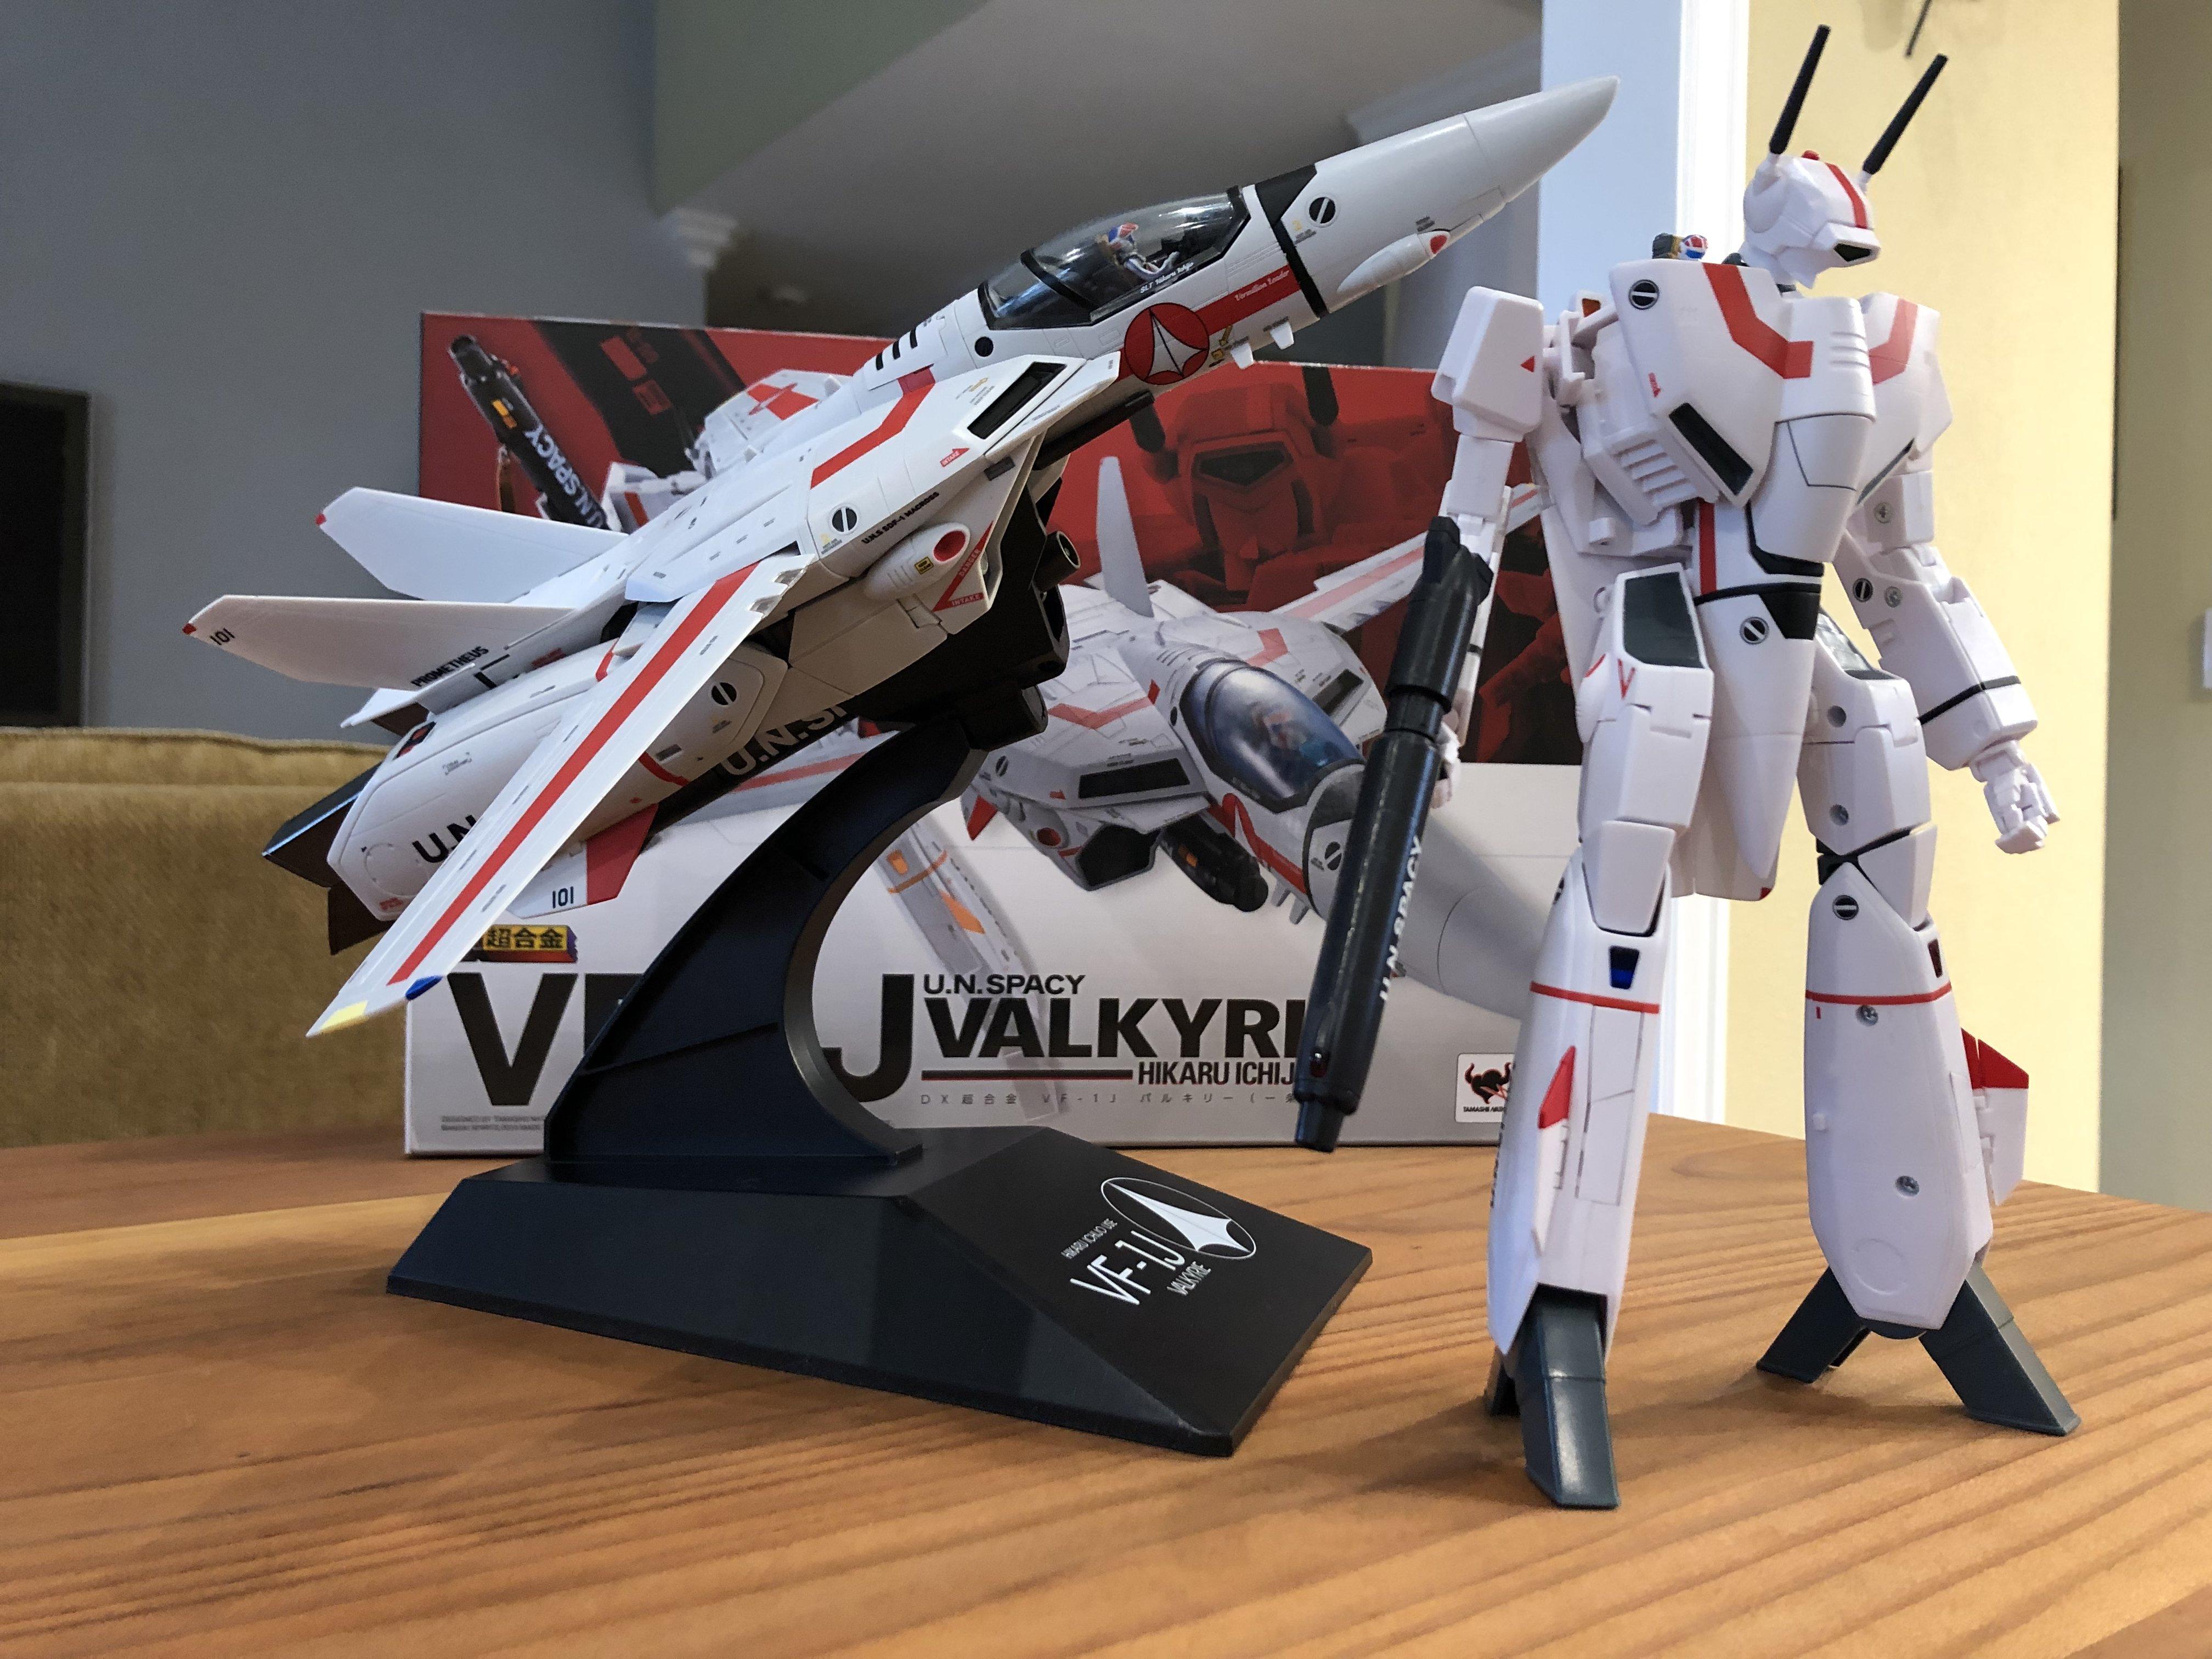 Bandai DX Chogokin 1/48 VF-1 - Page 210 - Toys - Macross